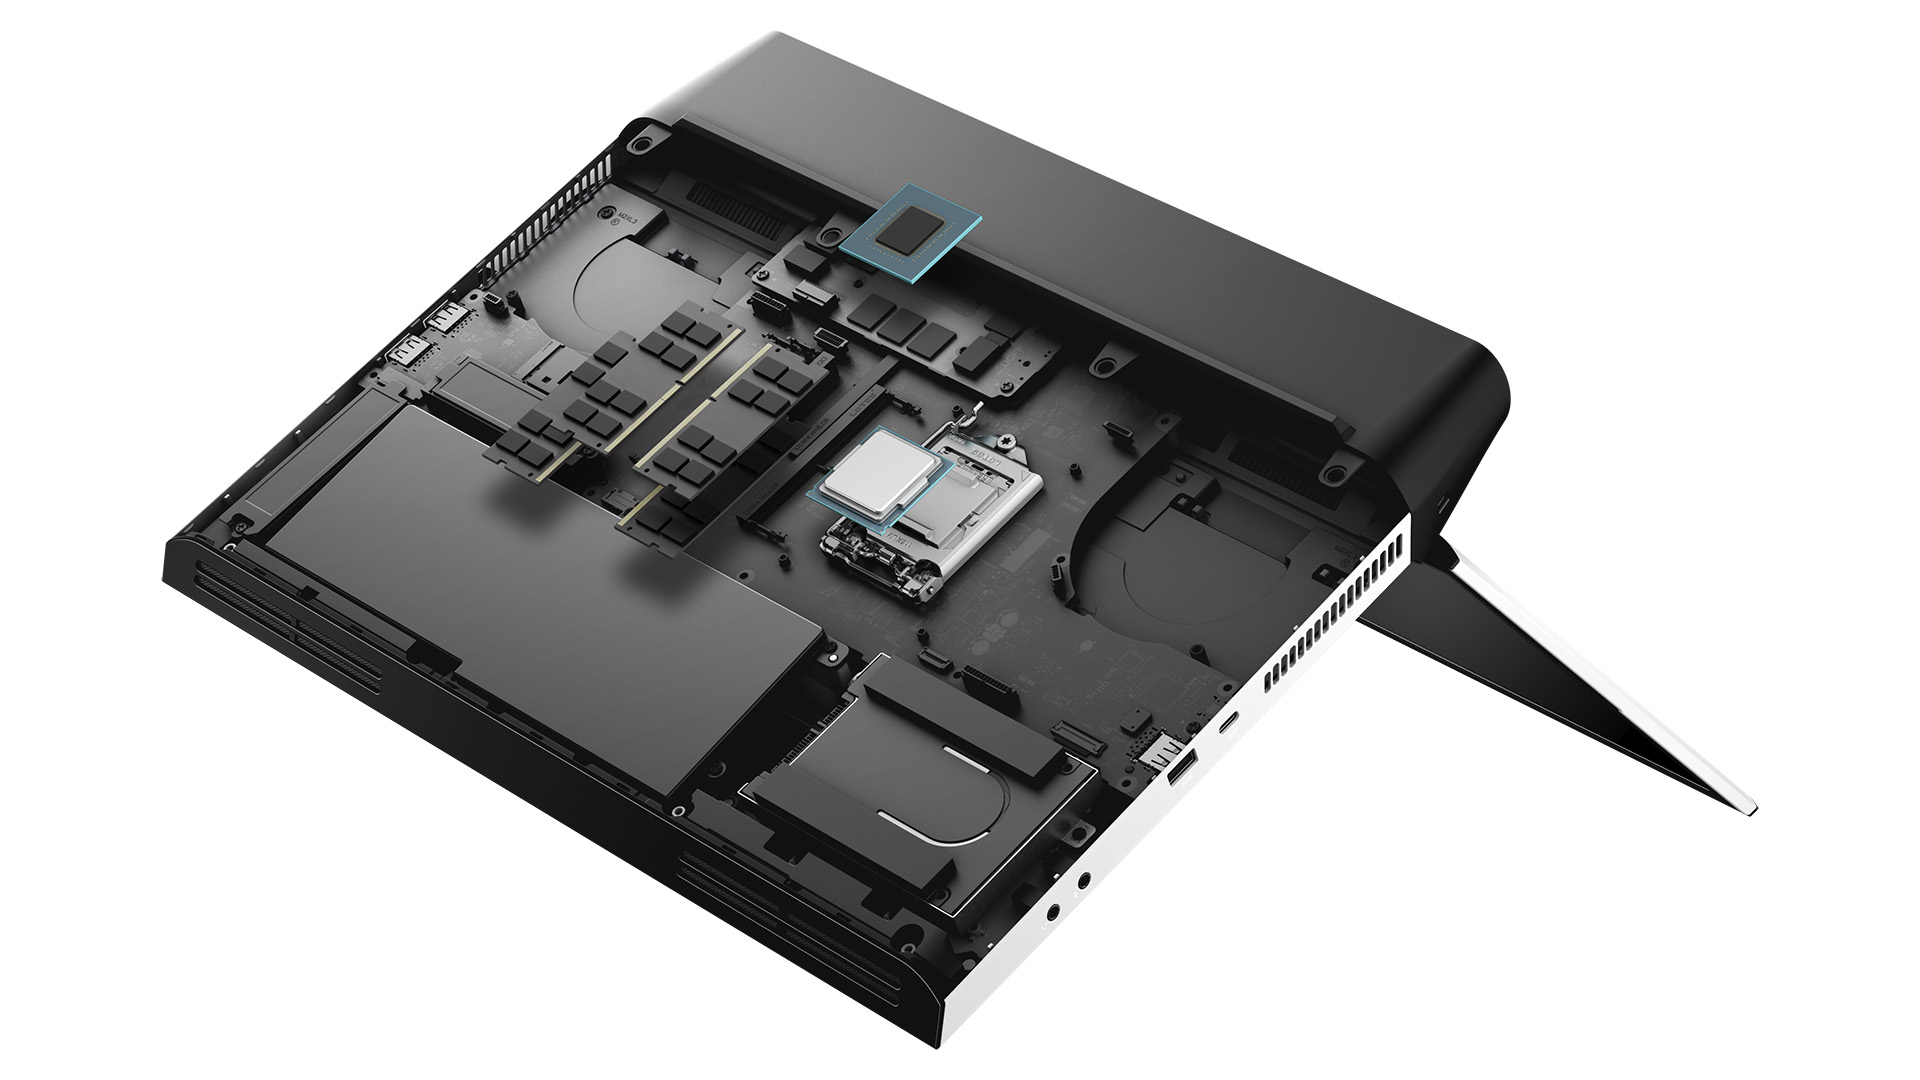 Dell и Alienware на CES 2019: гайд по всем основным новинкам - 14